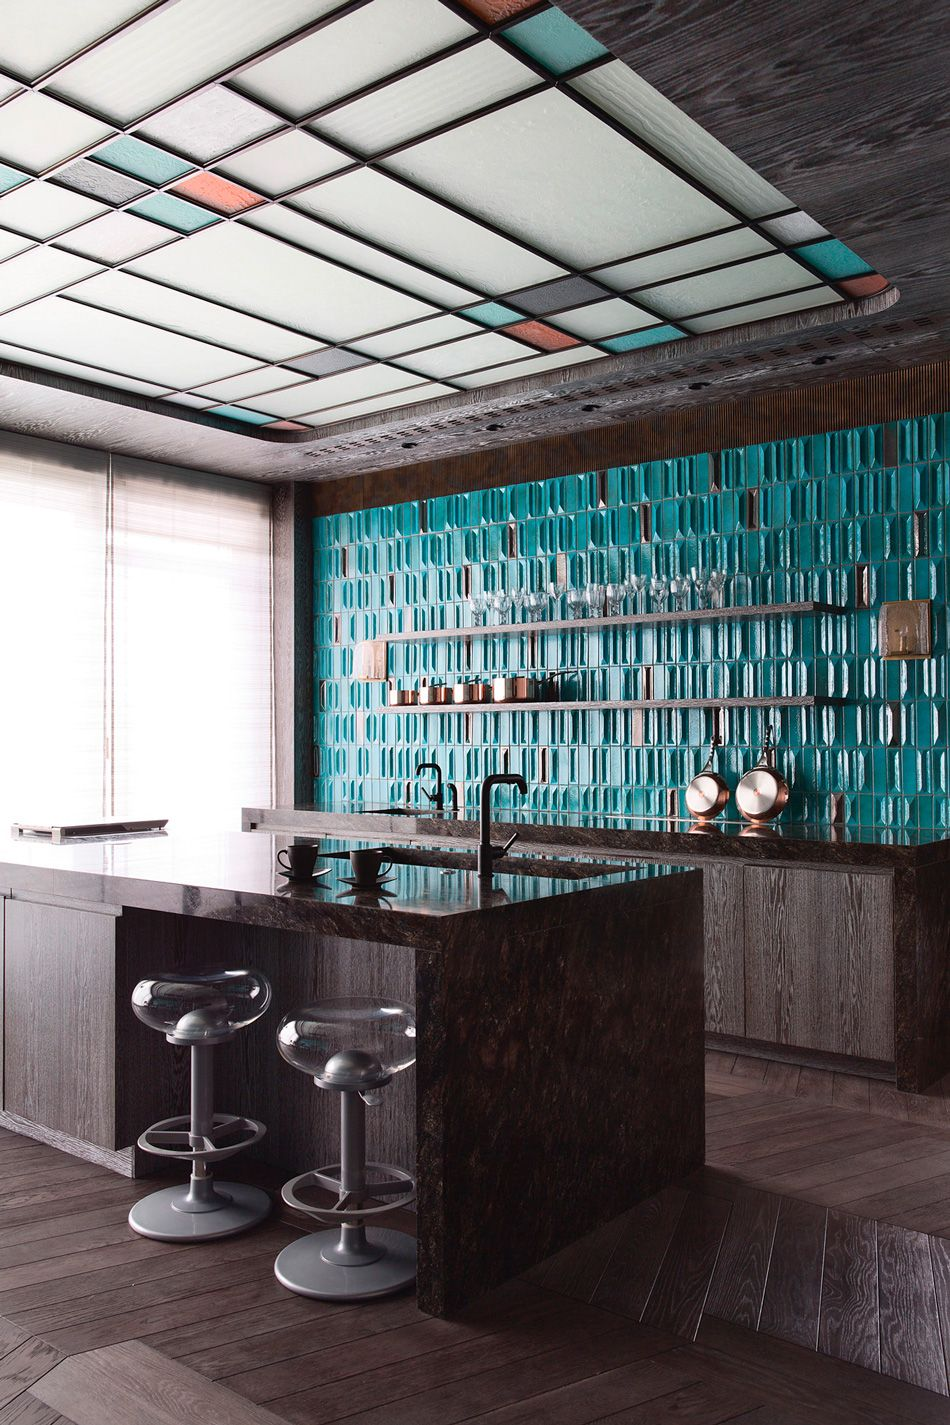 Katya house by Ekaterina Fedorchenko   Kitchen   Pinterest ...